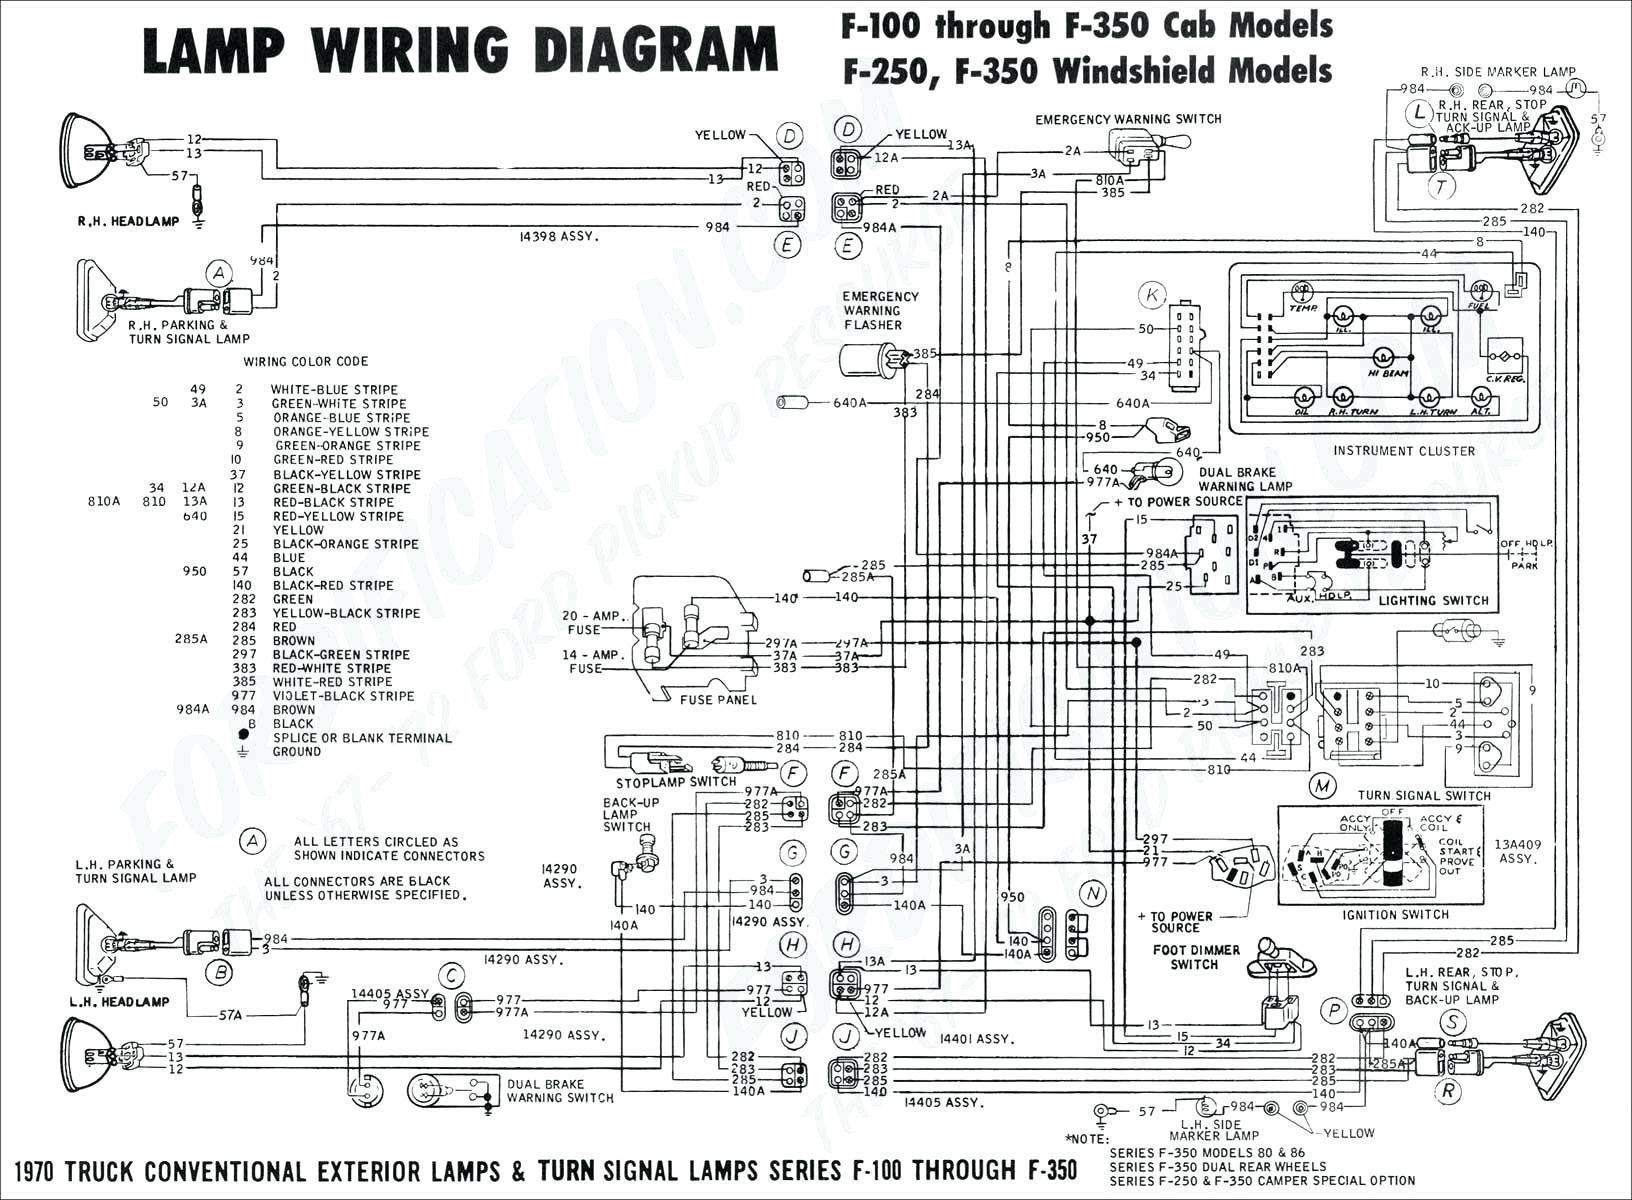 Isuzu Truck Radio Wiring Diagram Mitsubishi Chariot Wiring Diagram Worksheet and Wiring Diagram • Of Isuzu Truck Radio Wiring Diagram